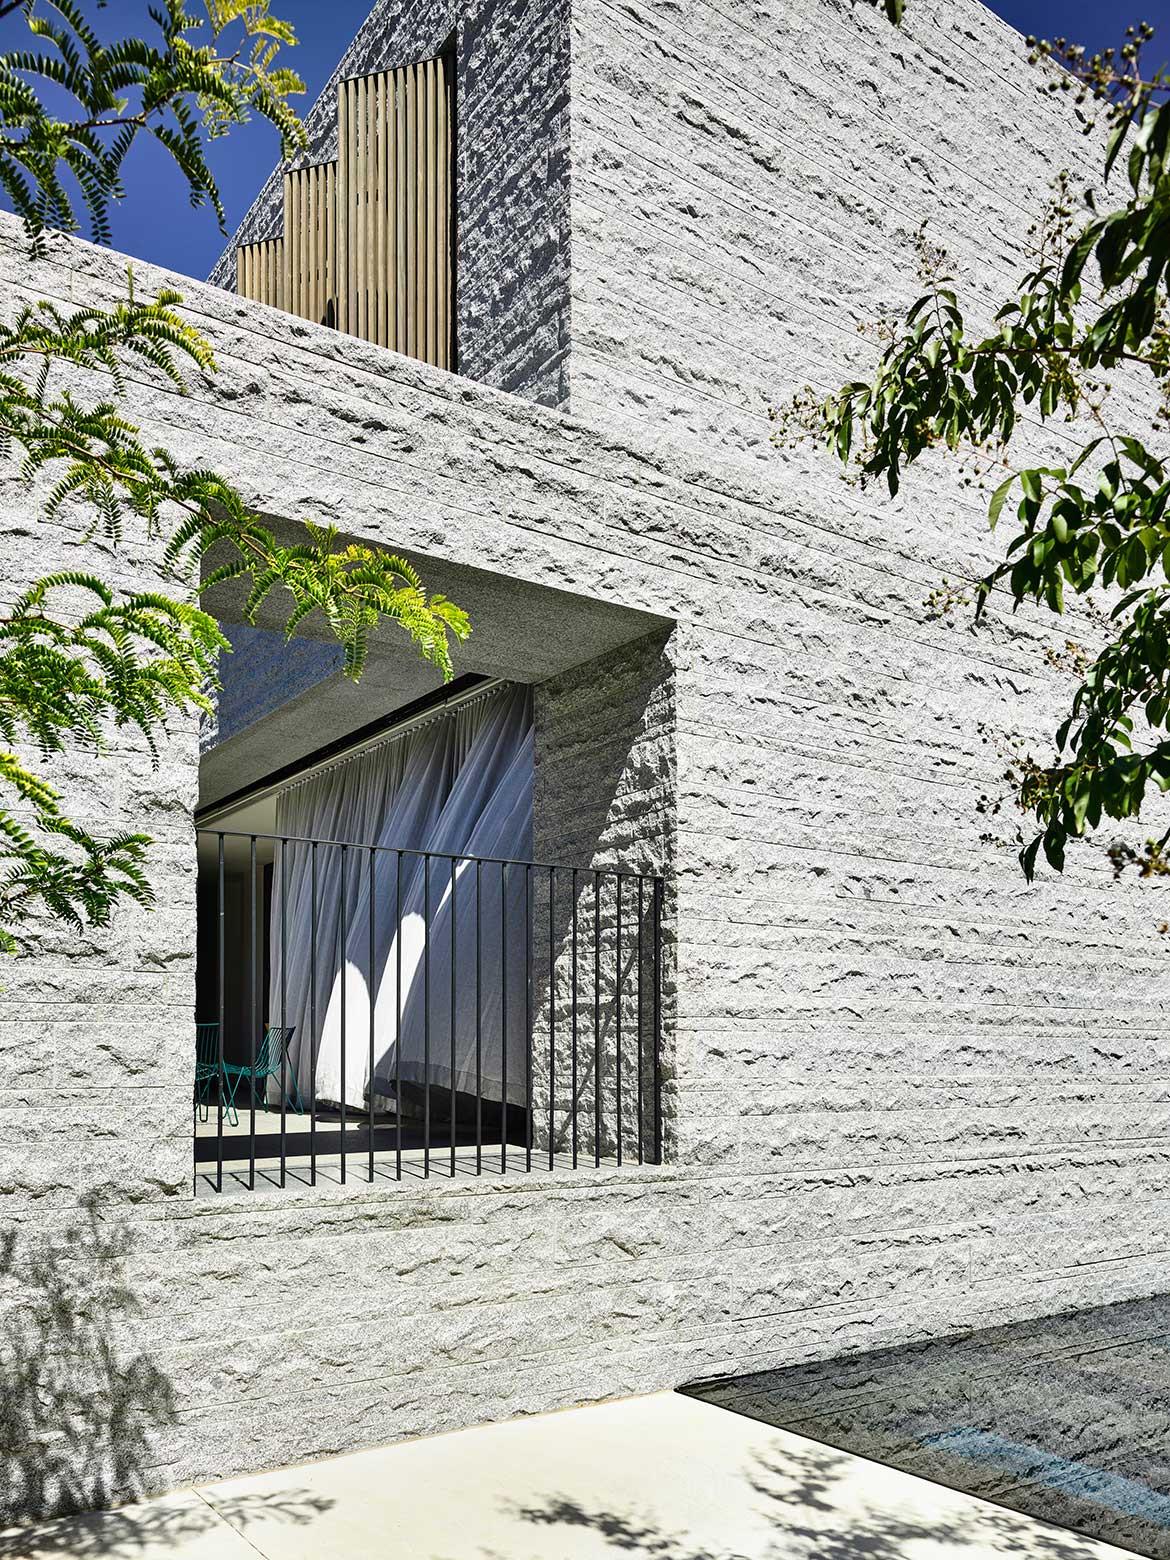 Armadale Residence B.E Architecture cc Derek Swalwell texture